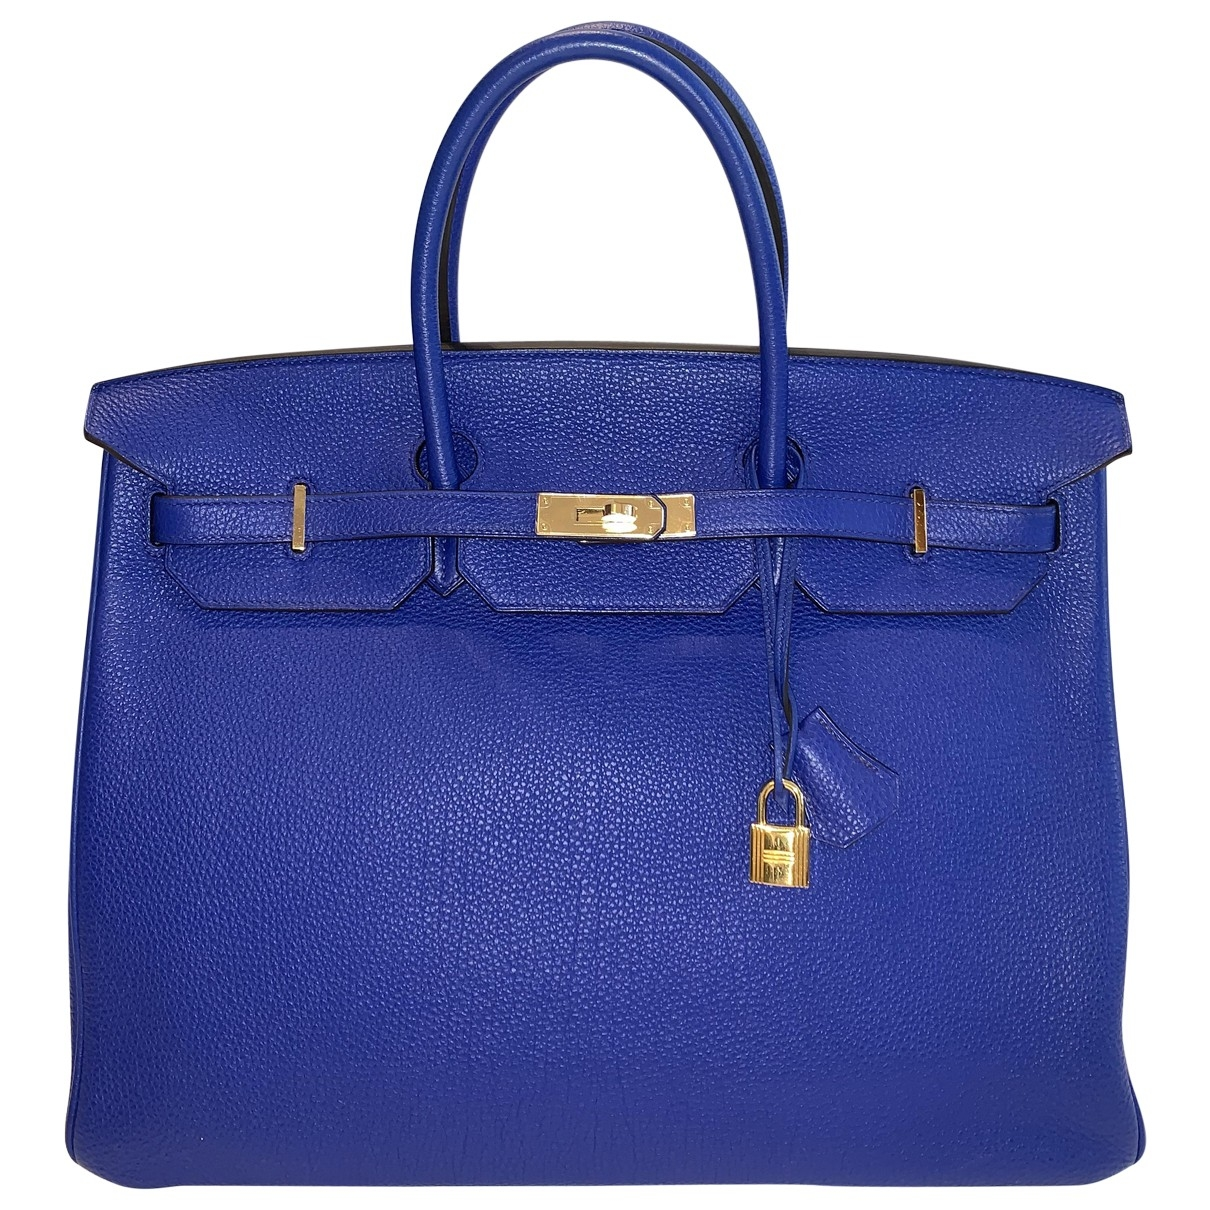 Hermes - Sac a main Birkin 40 pour femme en cuir - bleu